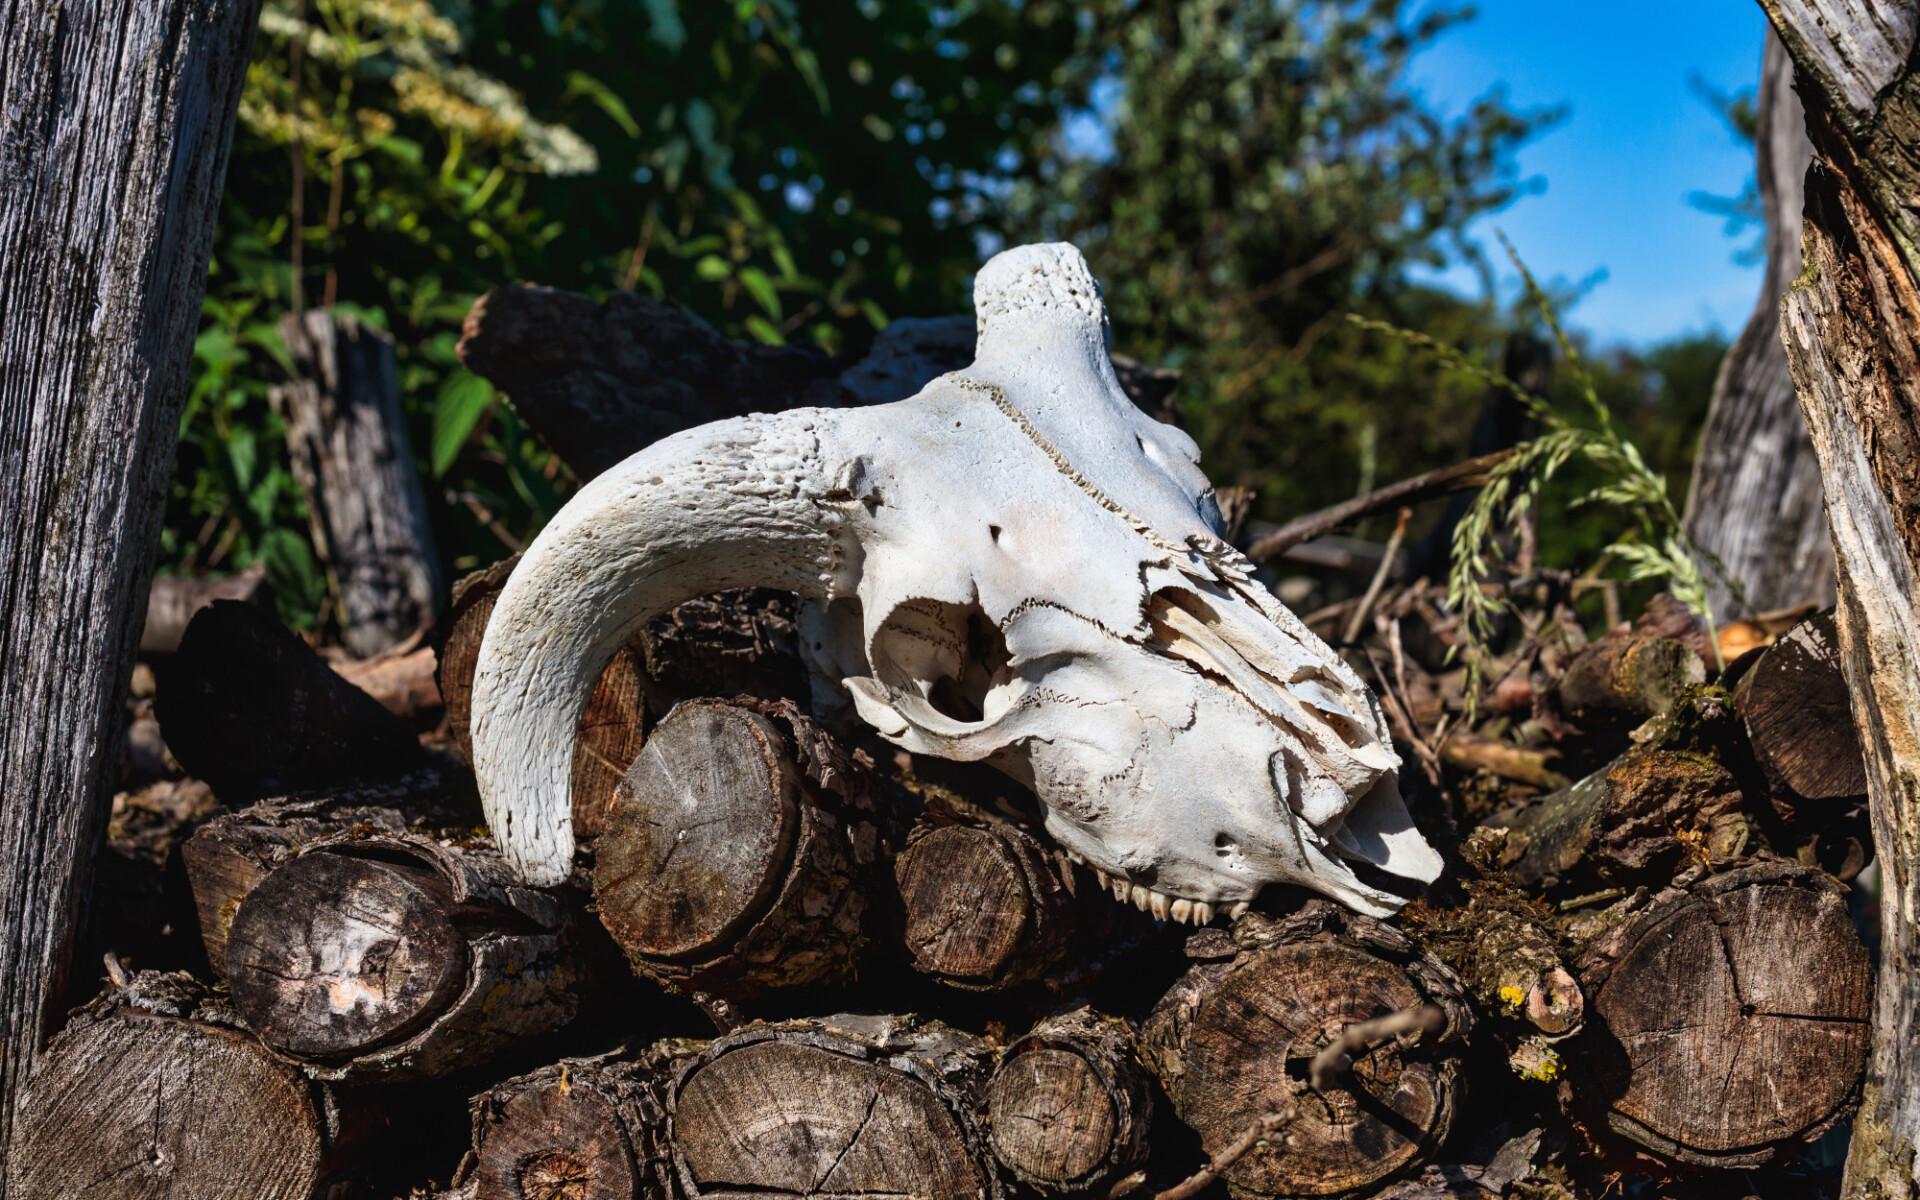 Skull of a sheep